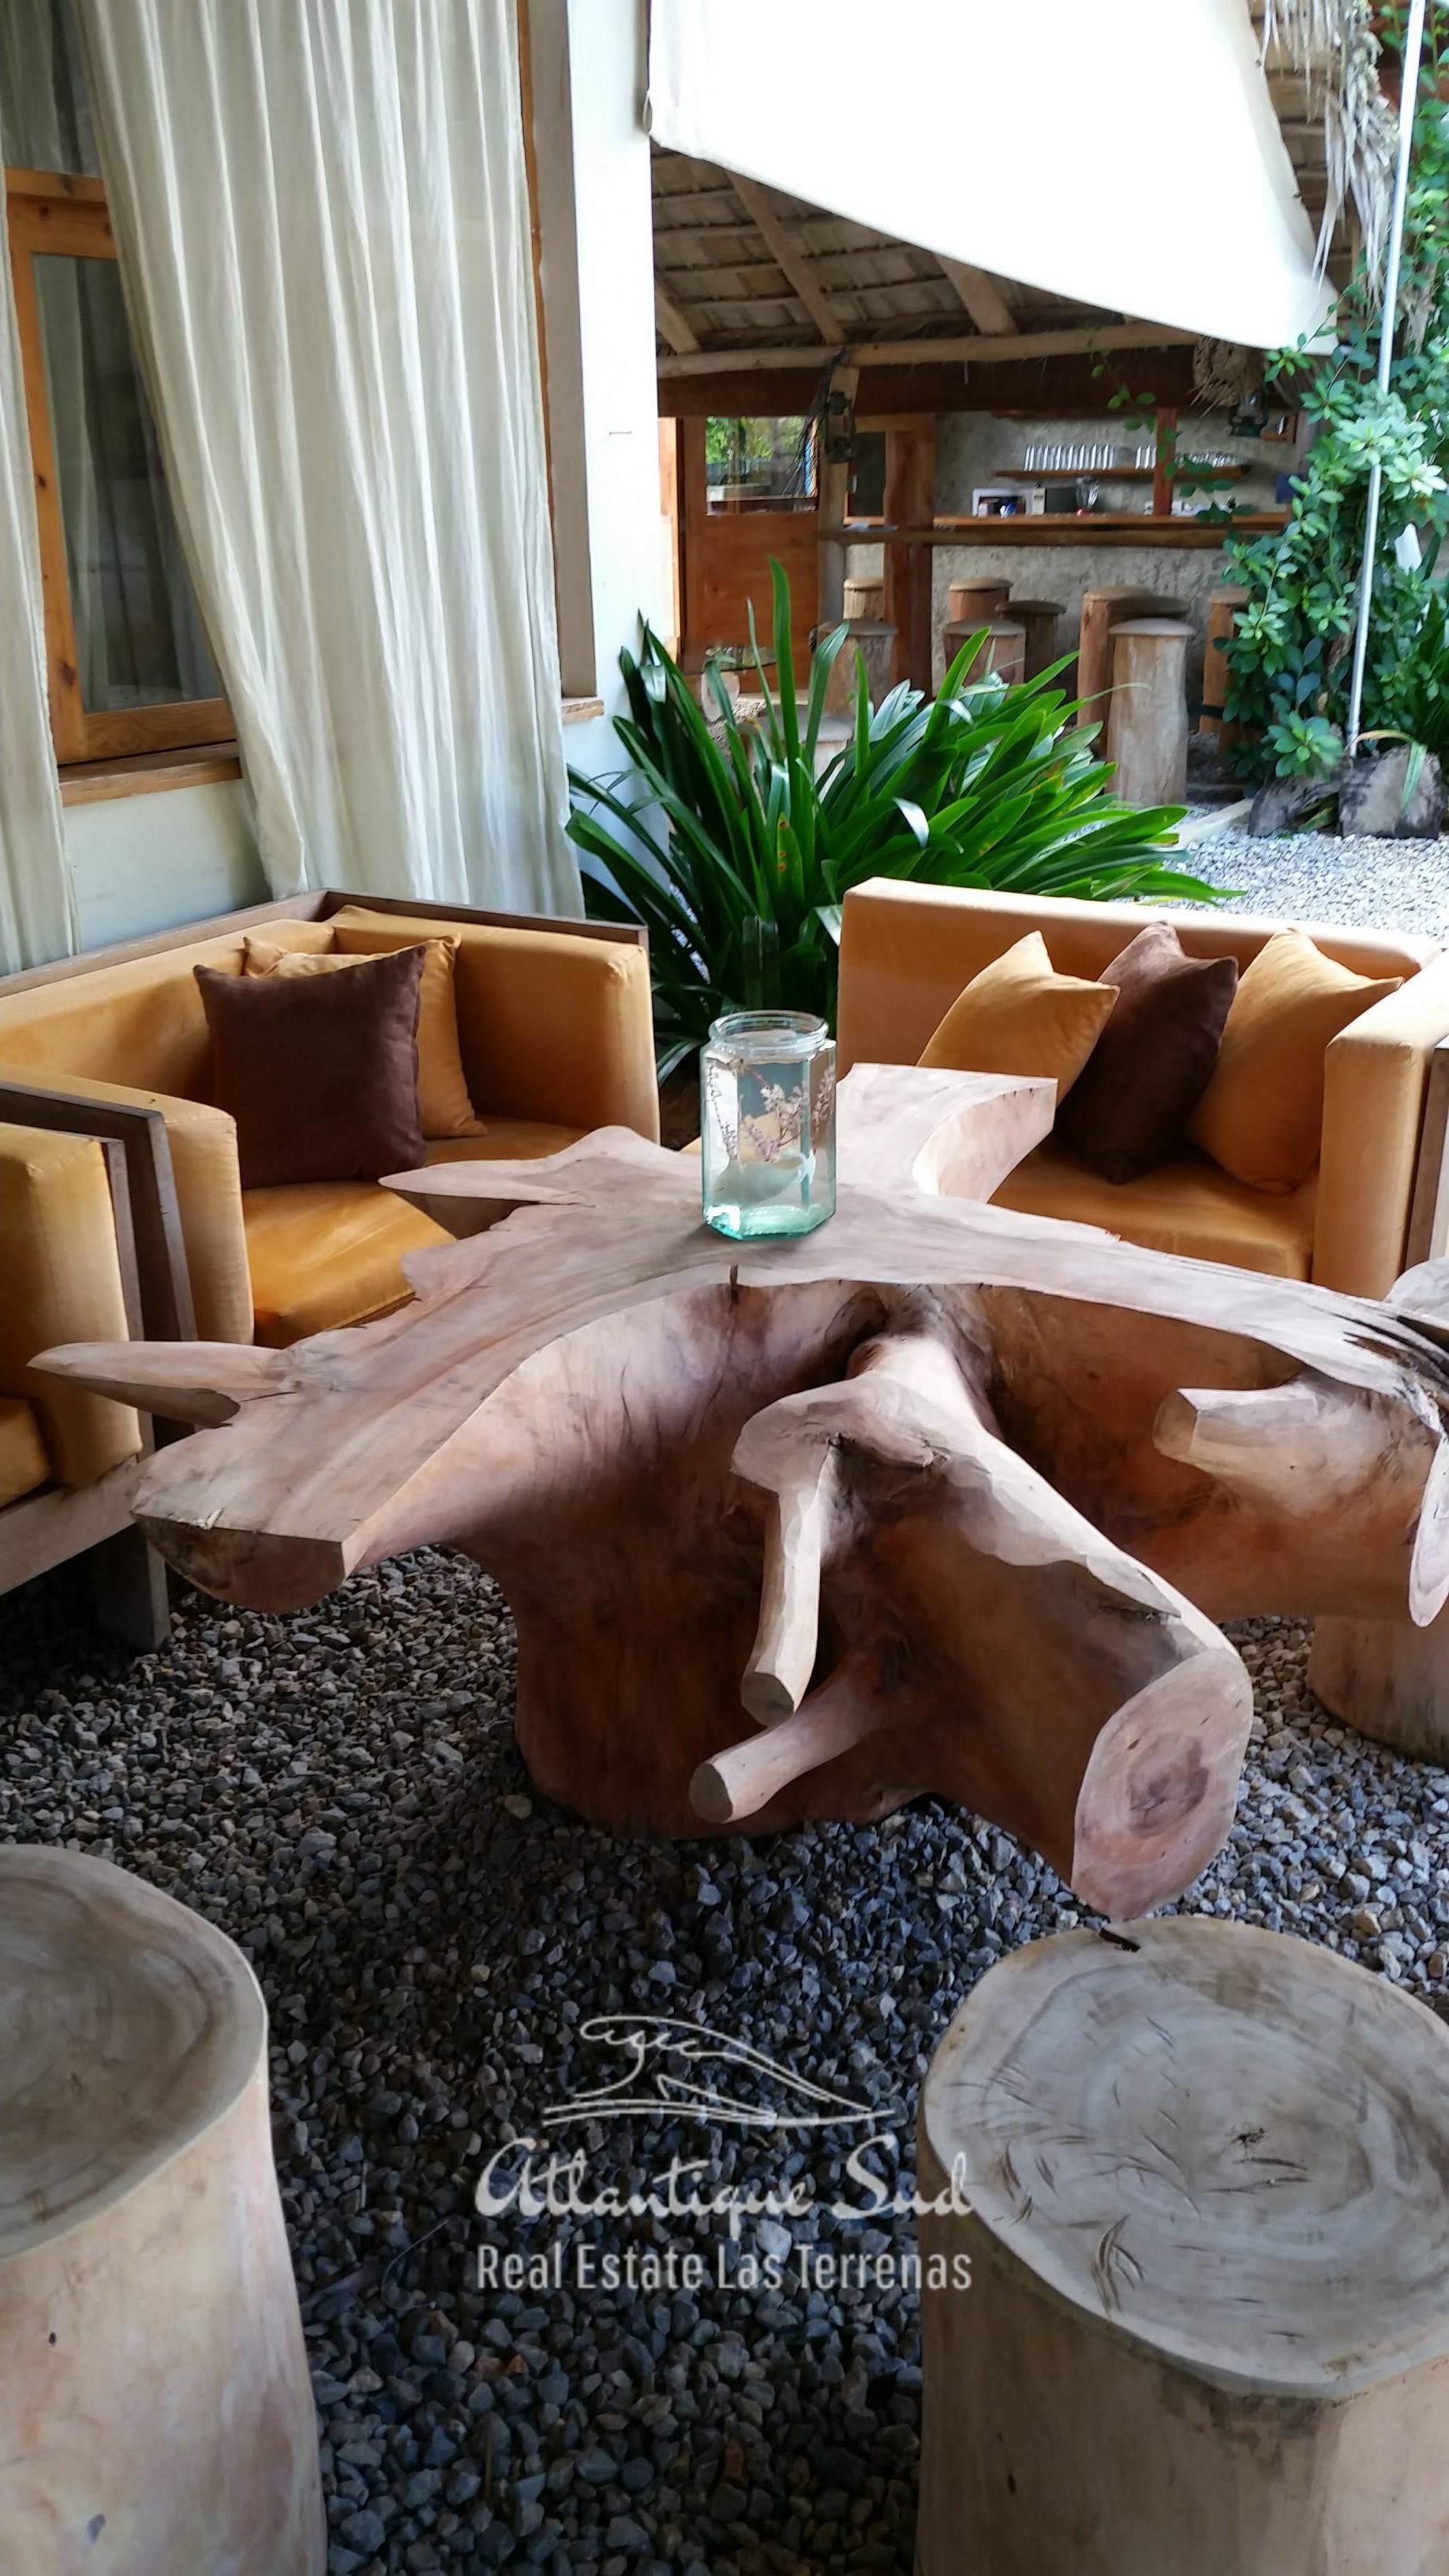 Typical caribbean hotel for sale Real Estate Las Terrenas Dominican Republic Atlantique Sud23.jpeg